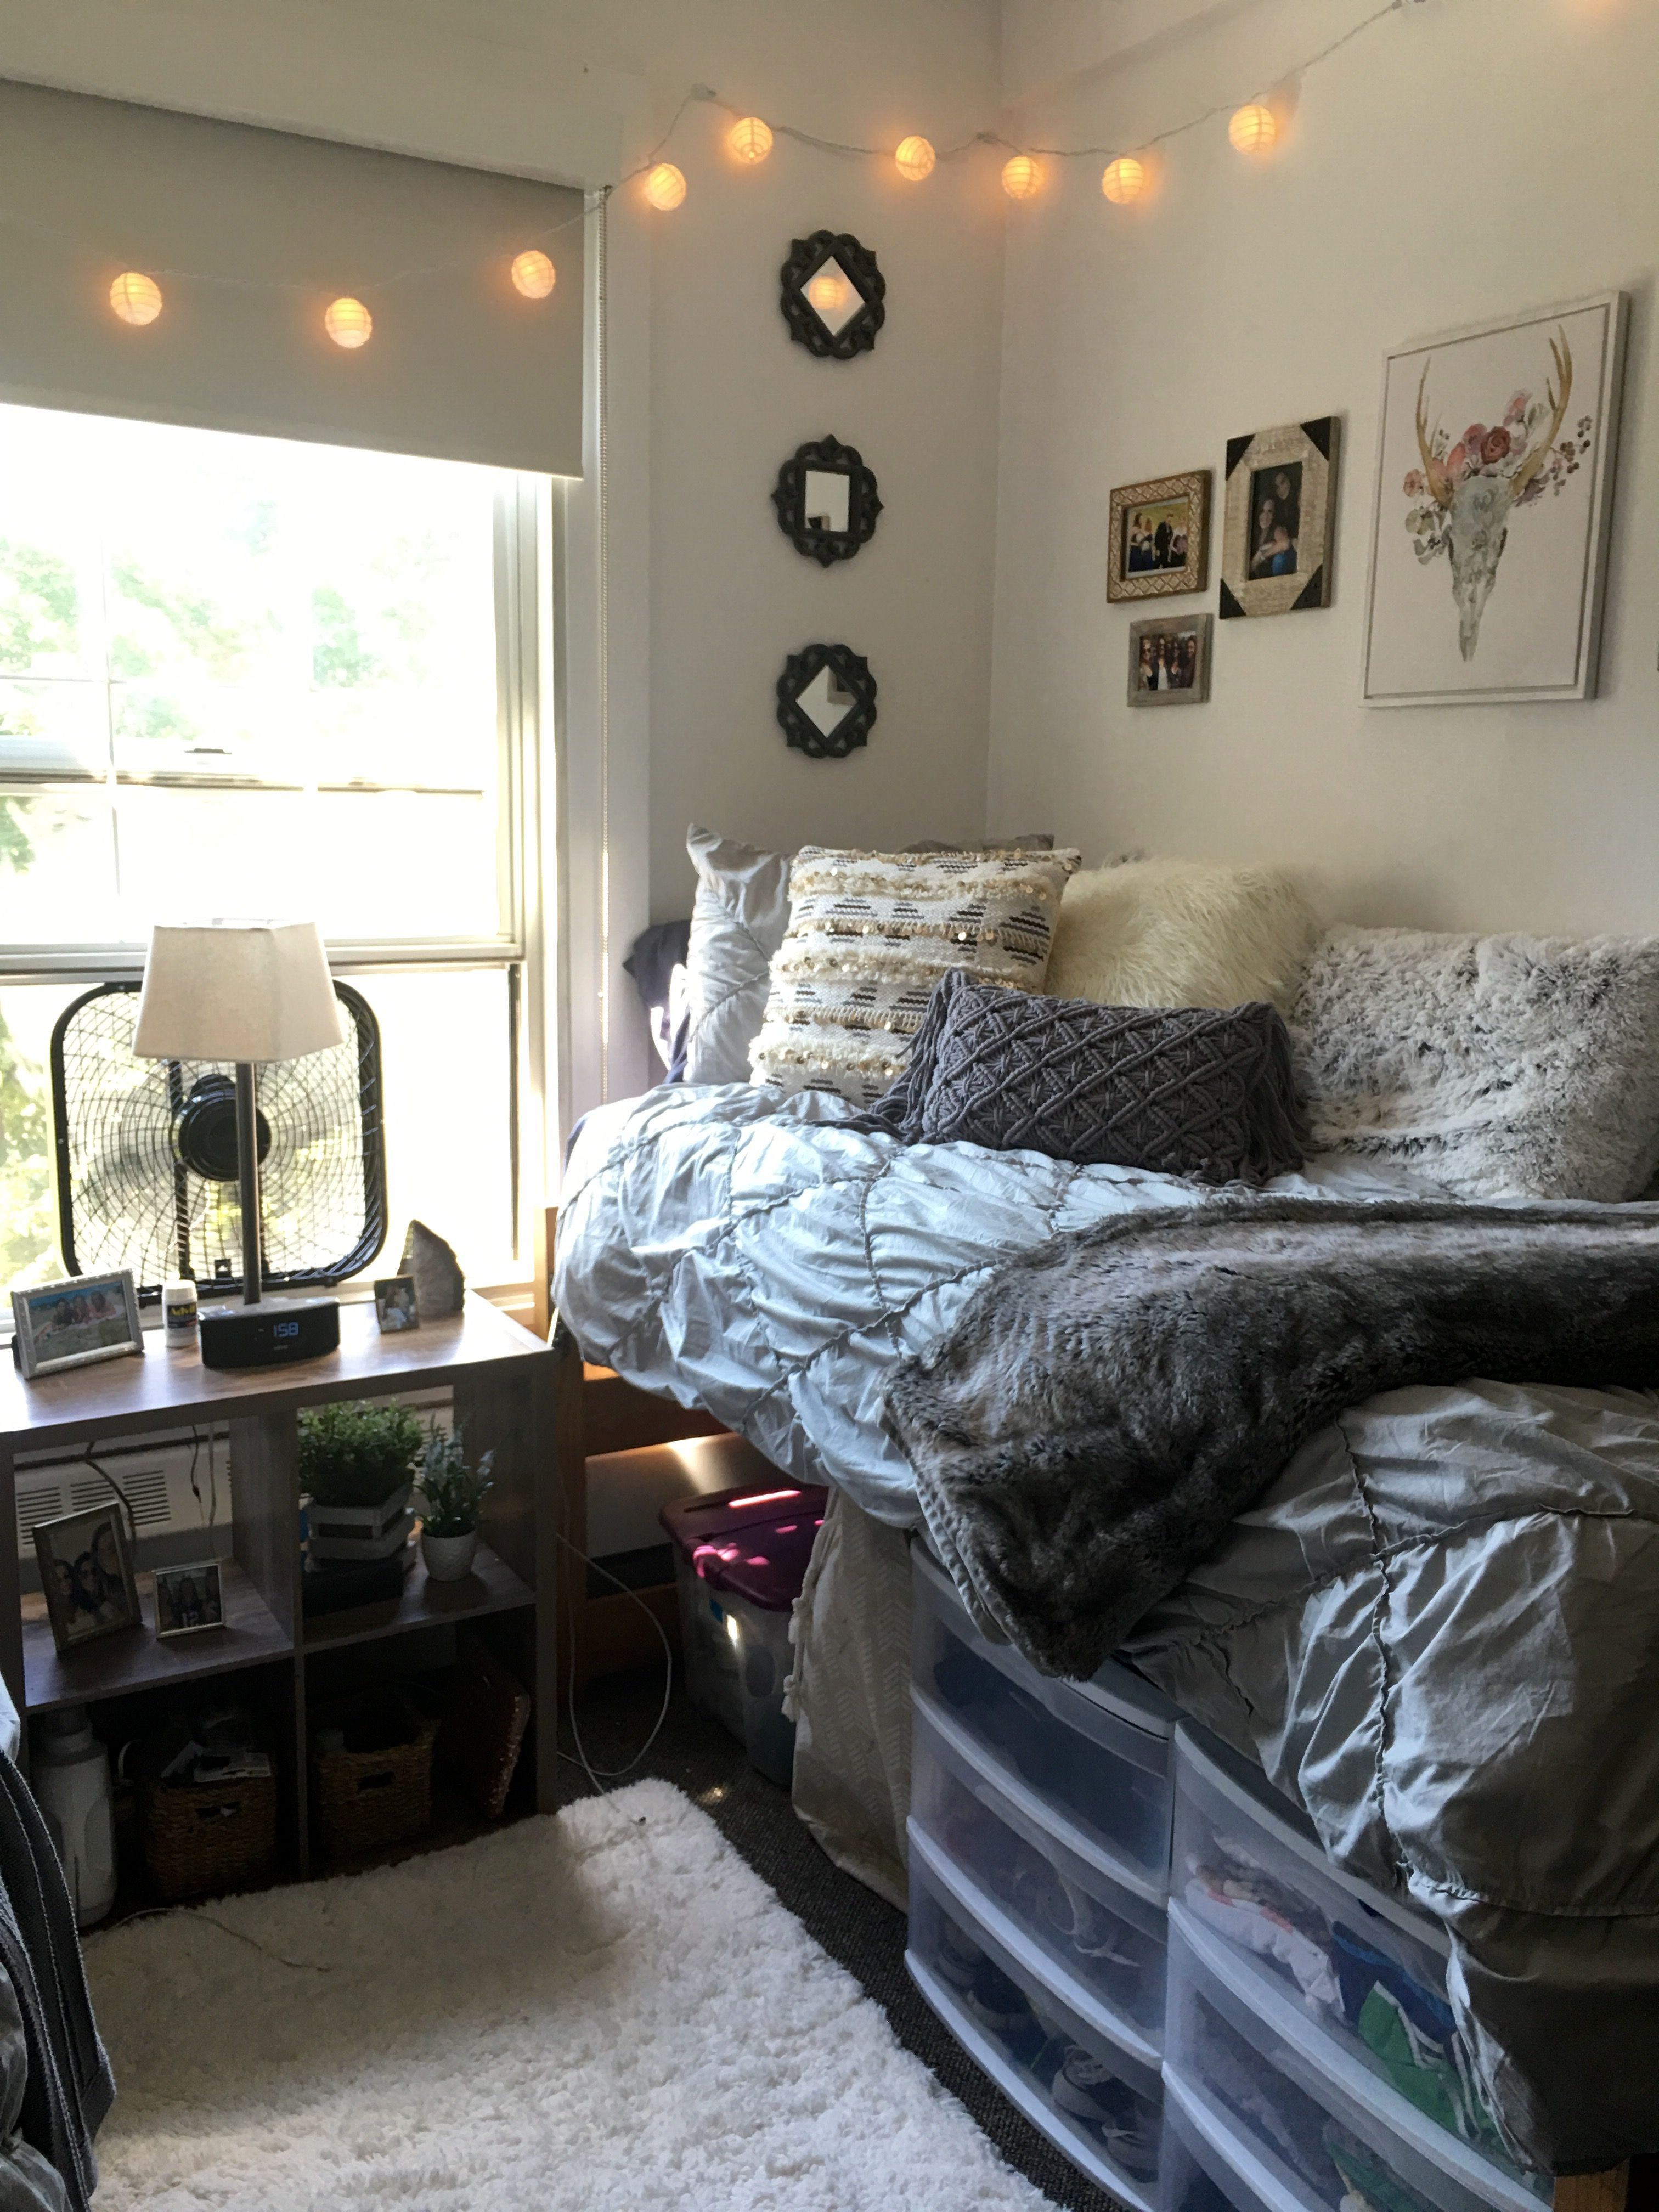 Holy Cross Dorm Common Room With Target Temporary Wallpaper TargetHomeDecor